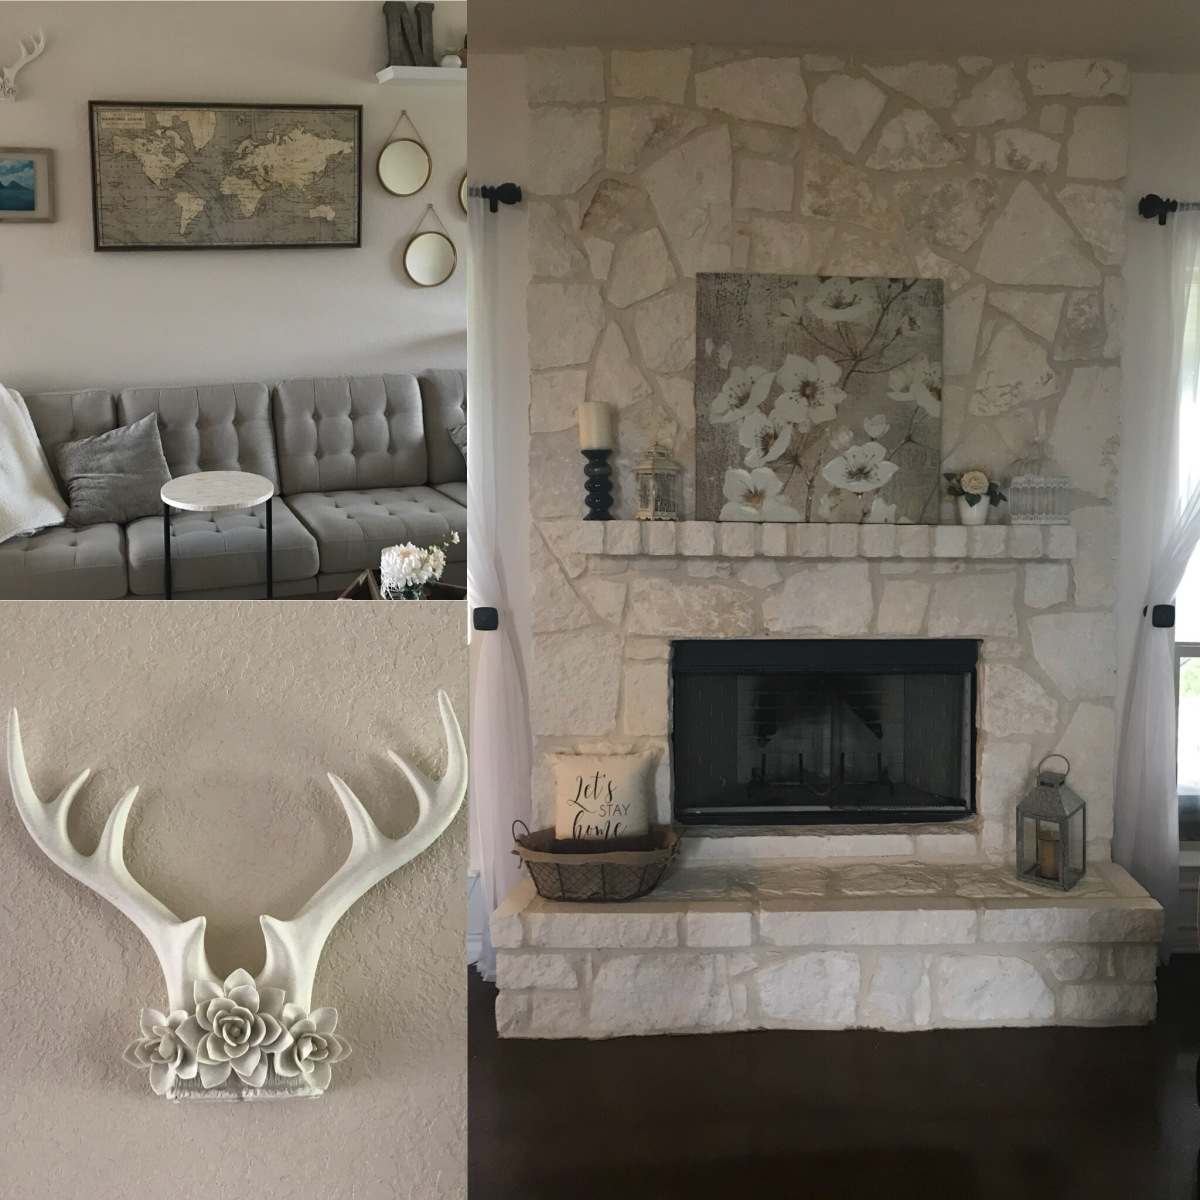 Rustic Farmhouse Decor   Fireplace / GalleryWall